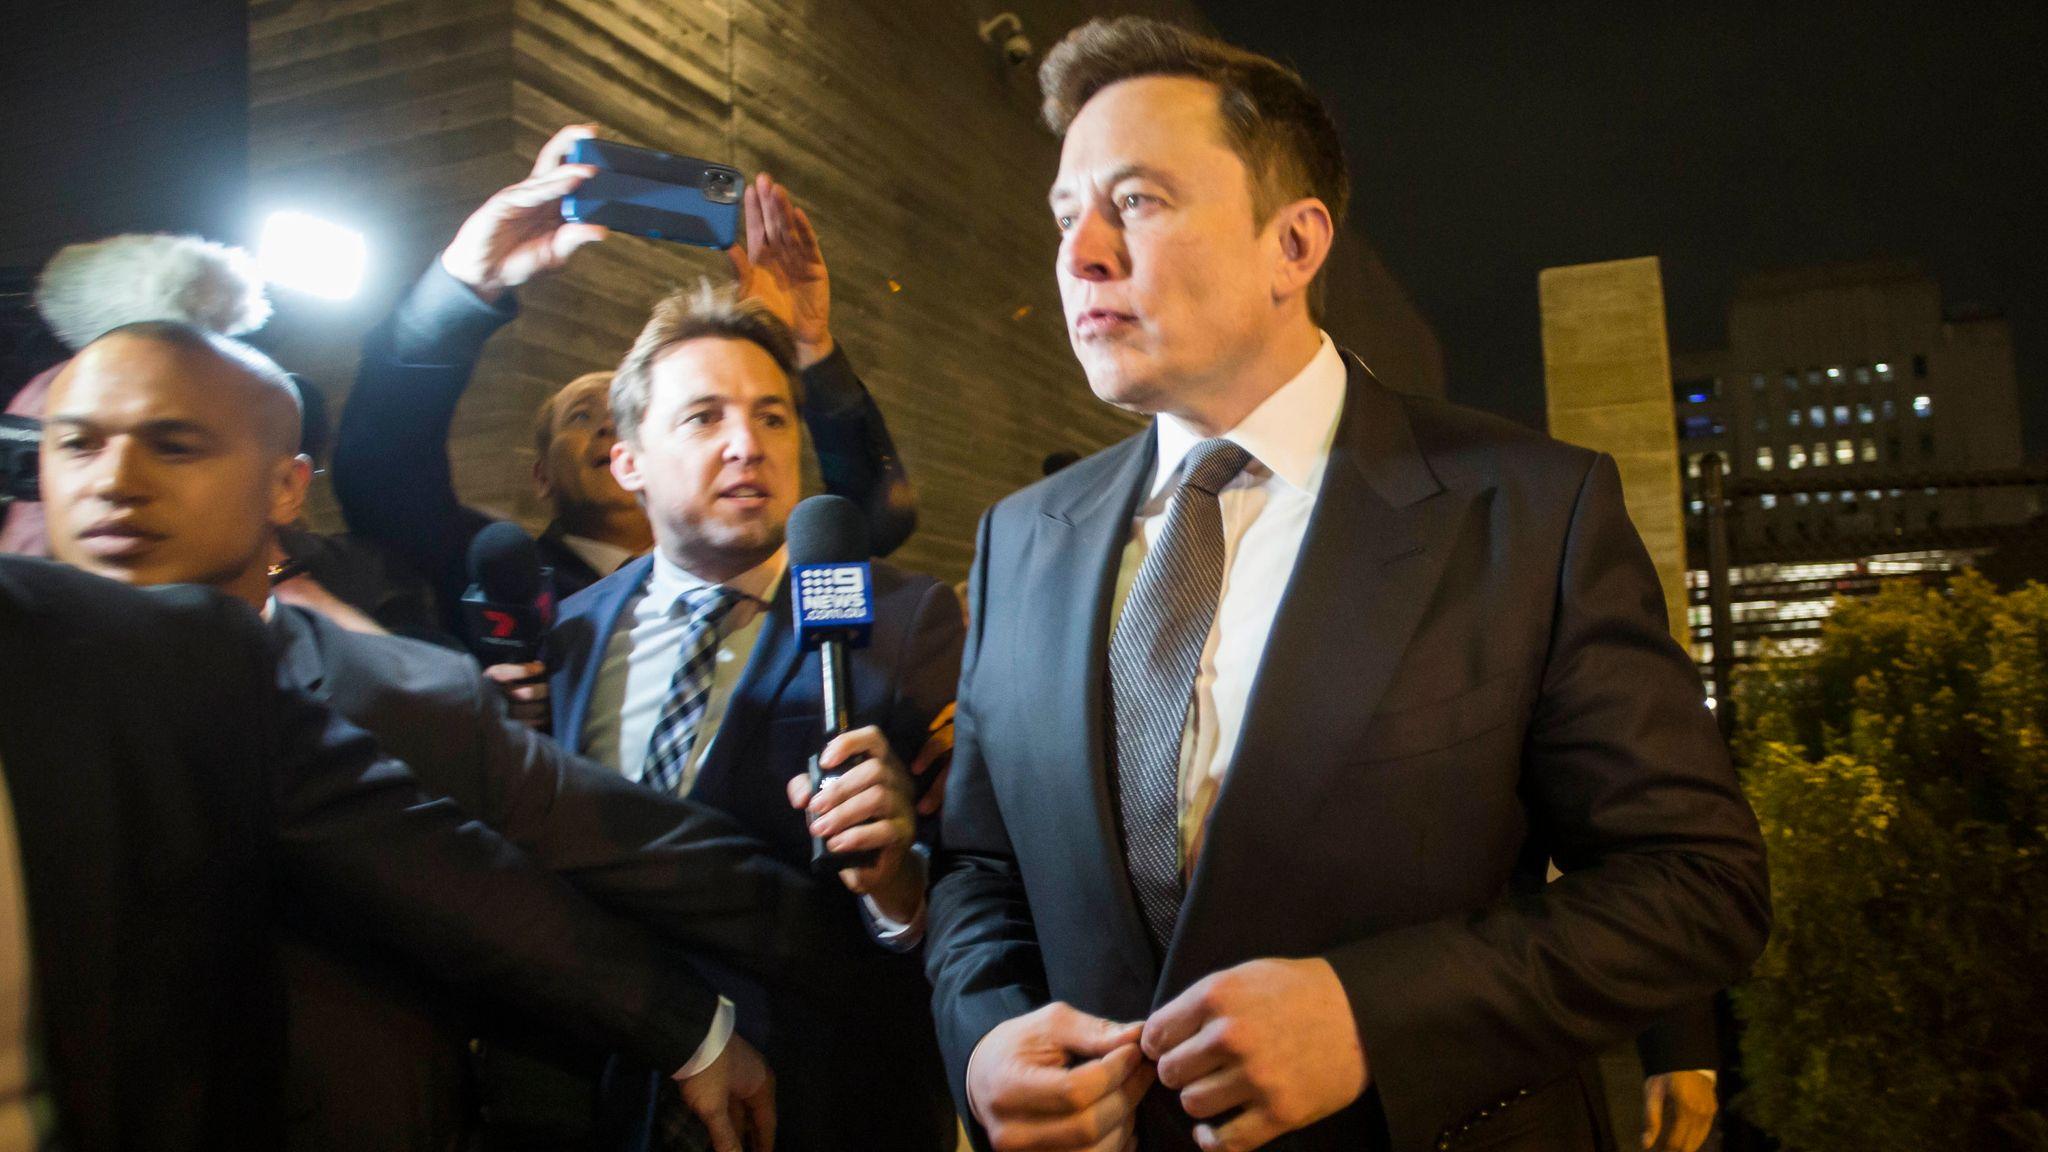 Elon Musk's win in 'pedo guy' case could set 'dark' precedent